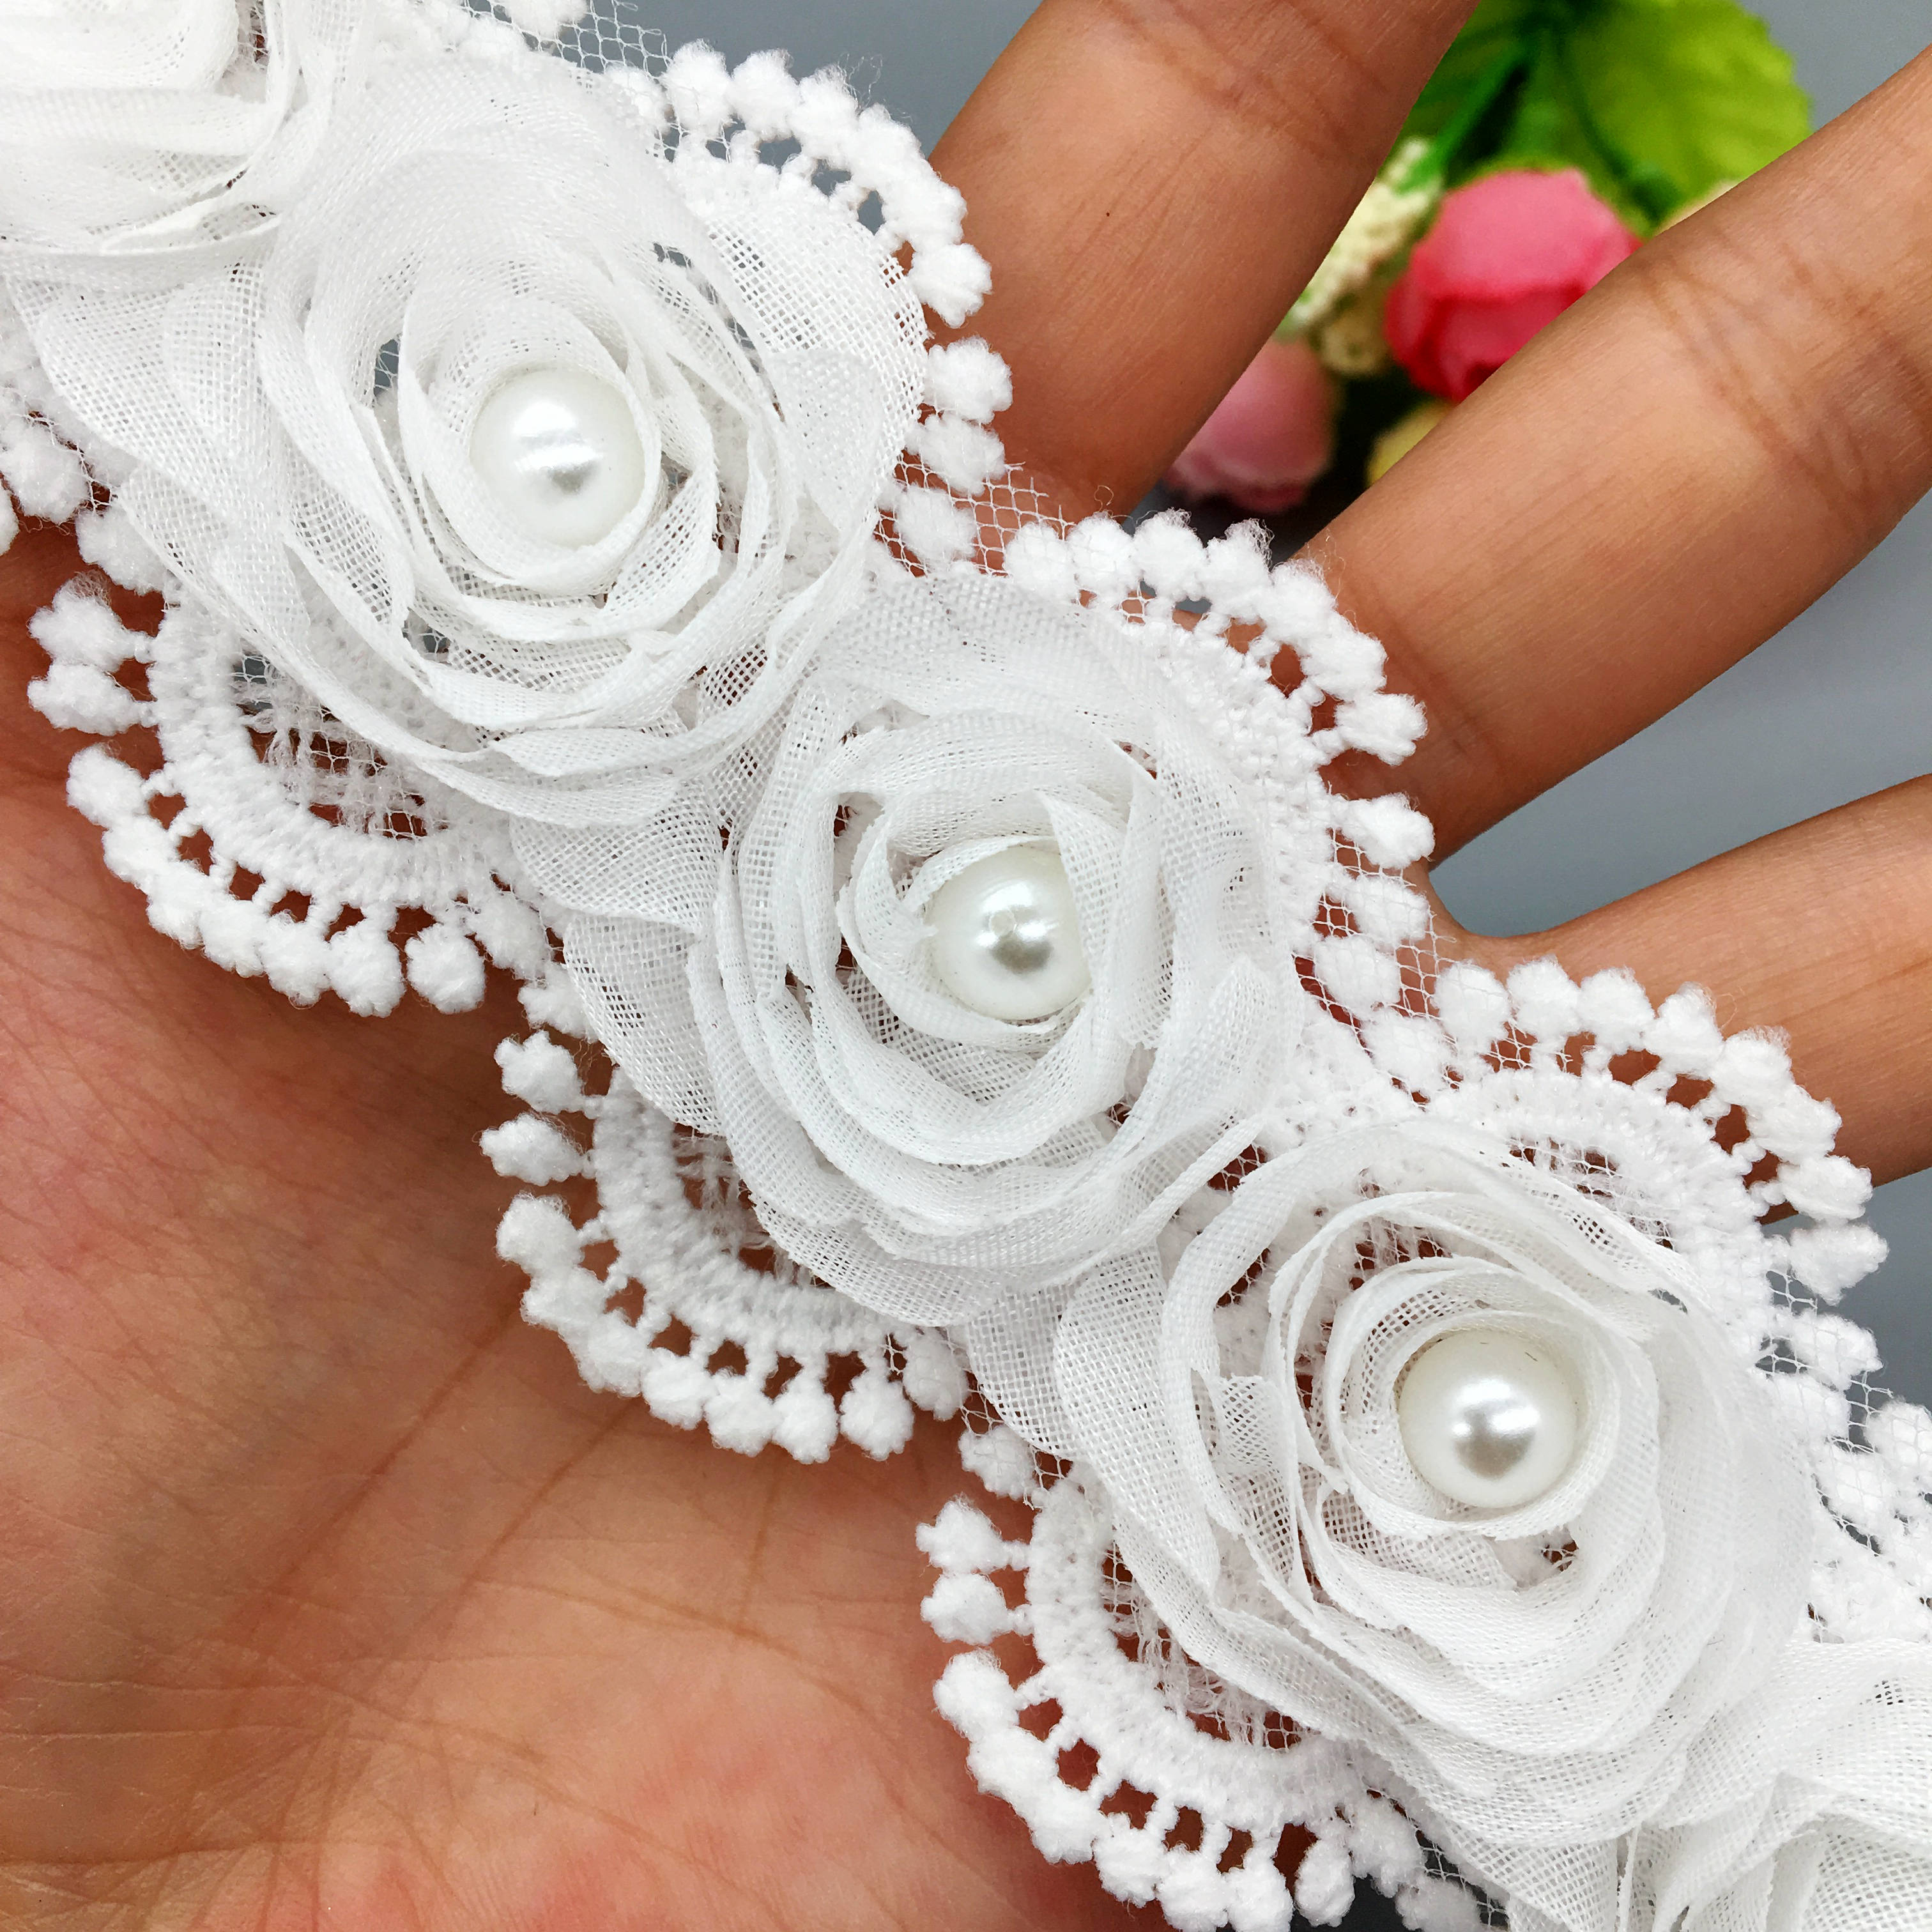 1yd White Vintage Cotton Pearl Beaded Lace Chiffon Trim Wedding Sewing Craft DIY